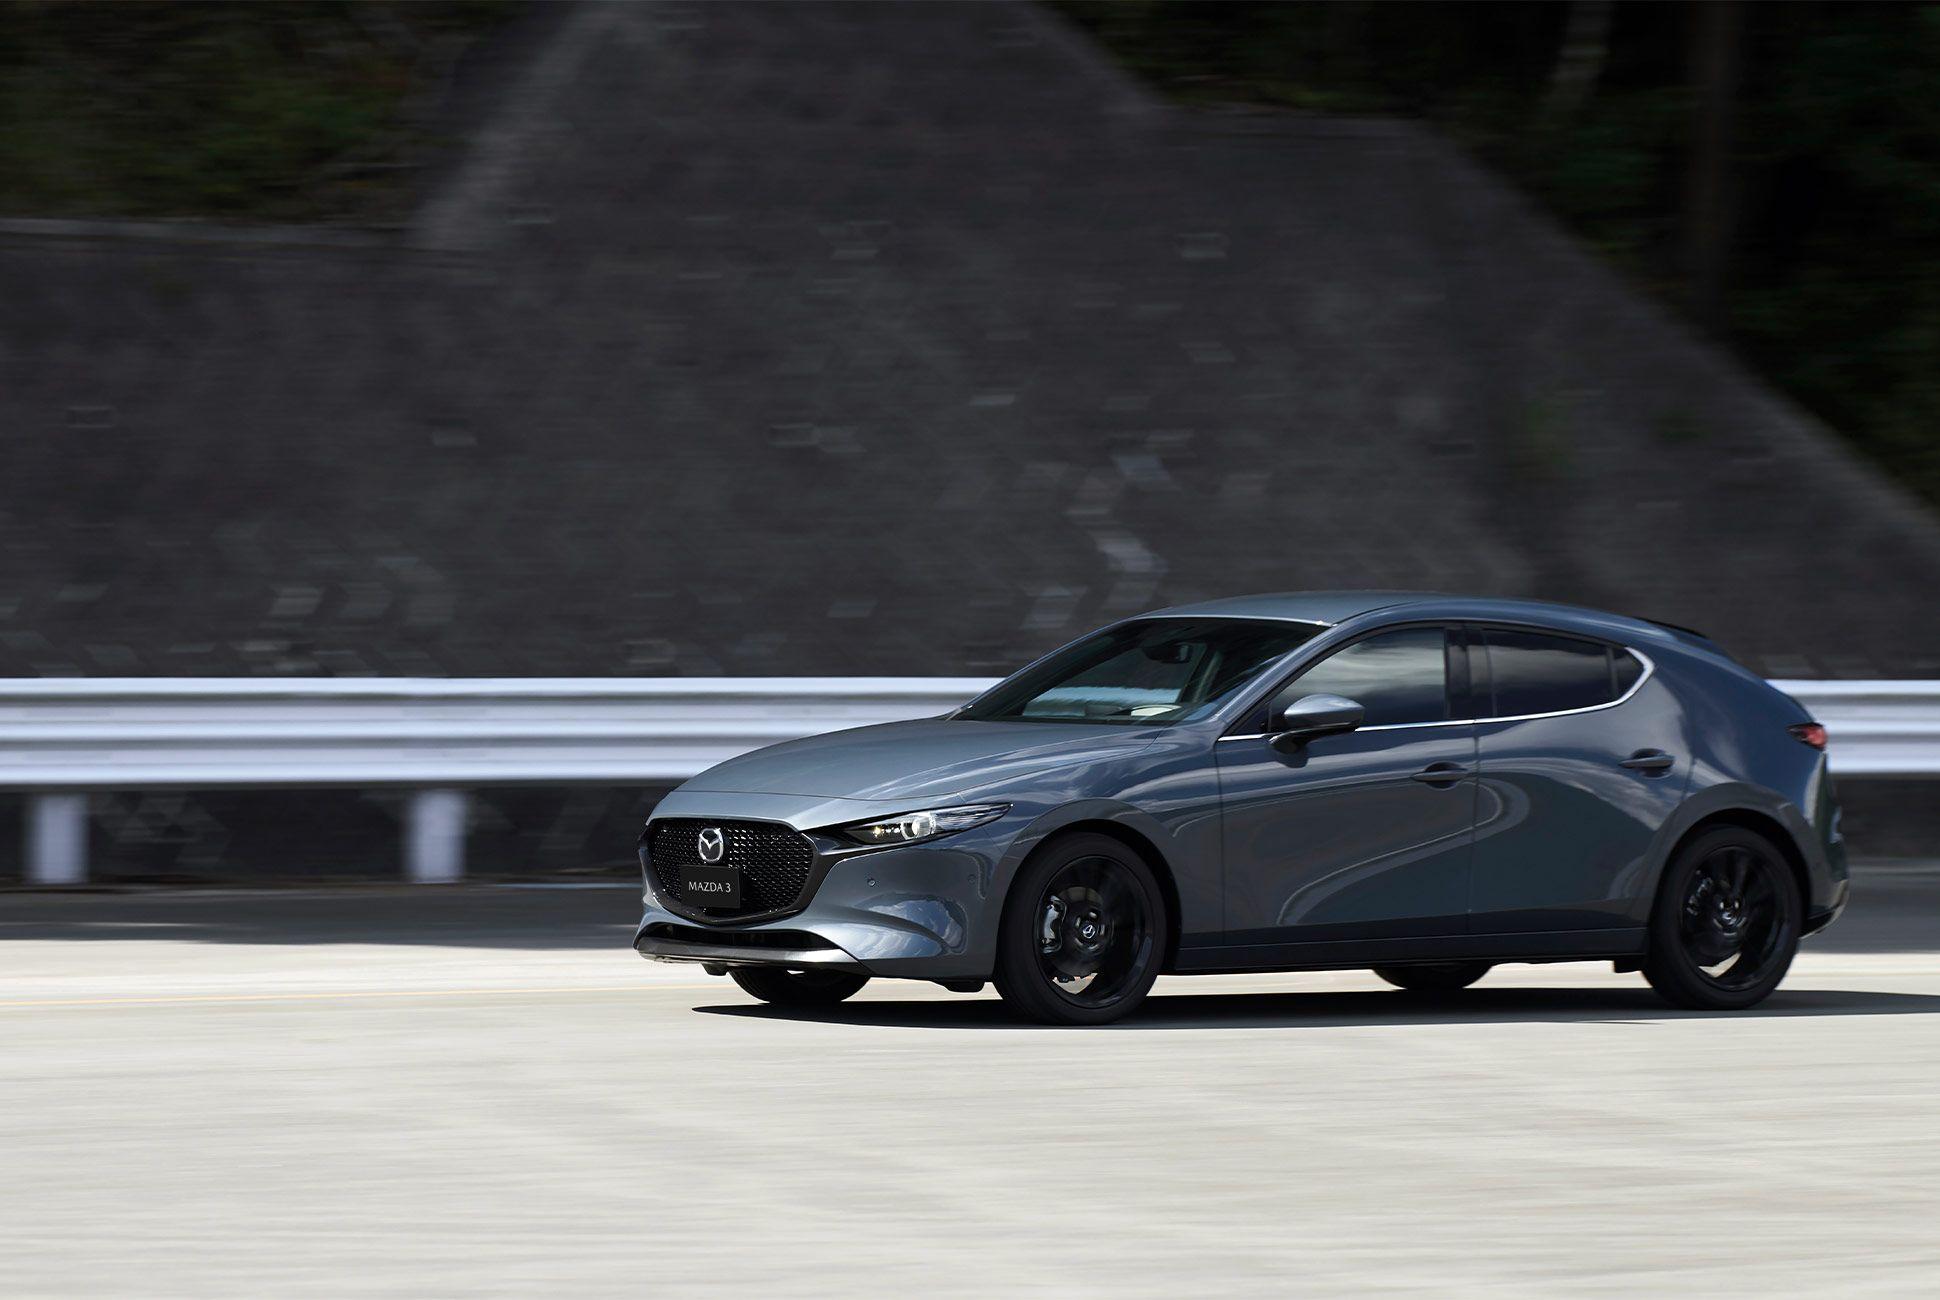 Kekurangan All New Mazda3 Tangguh